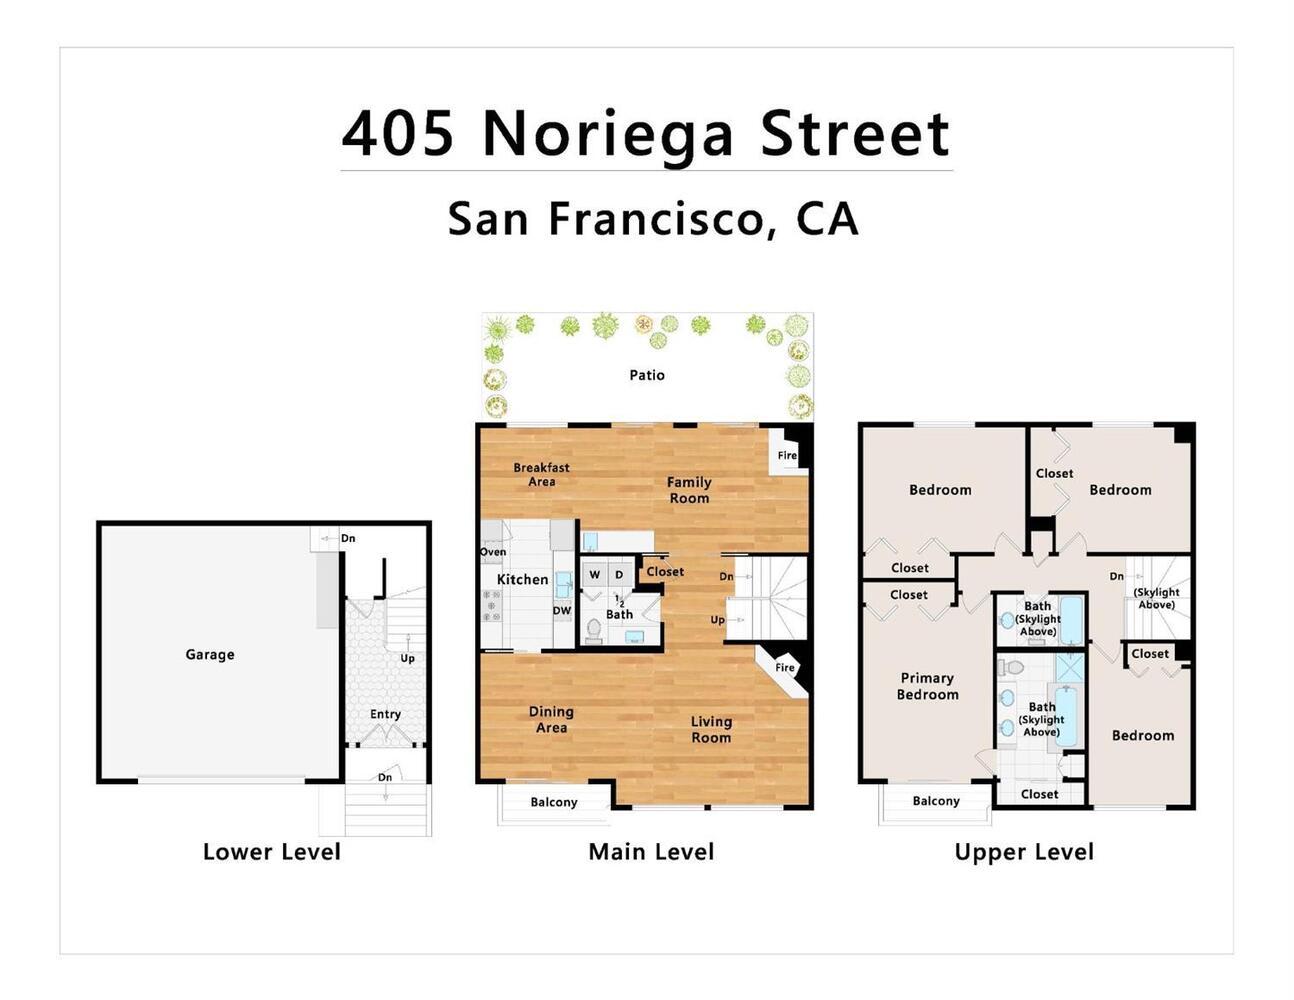 405 Noriega St photo